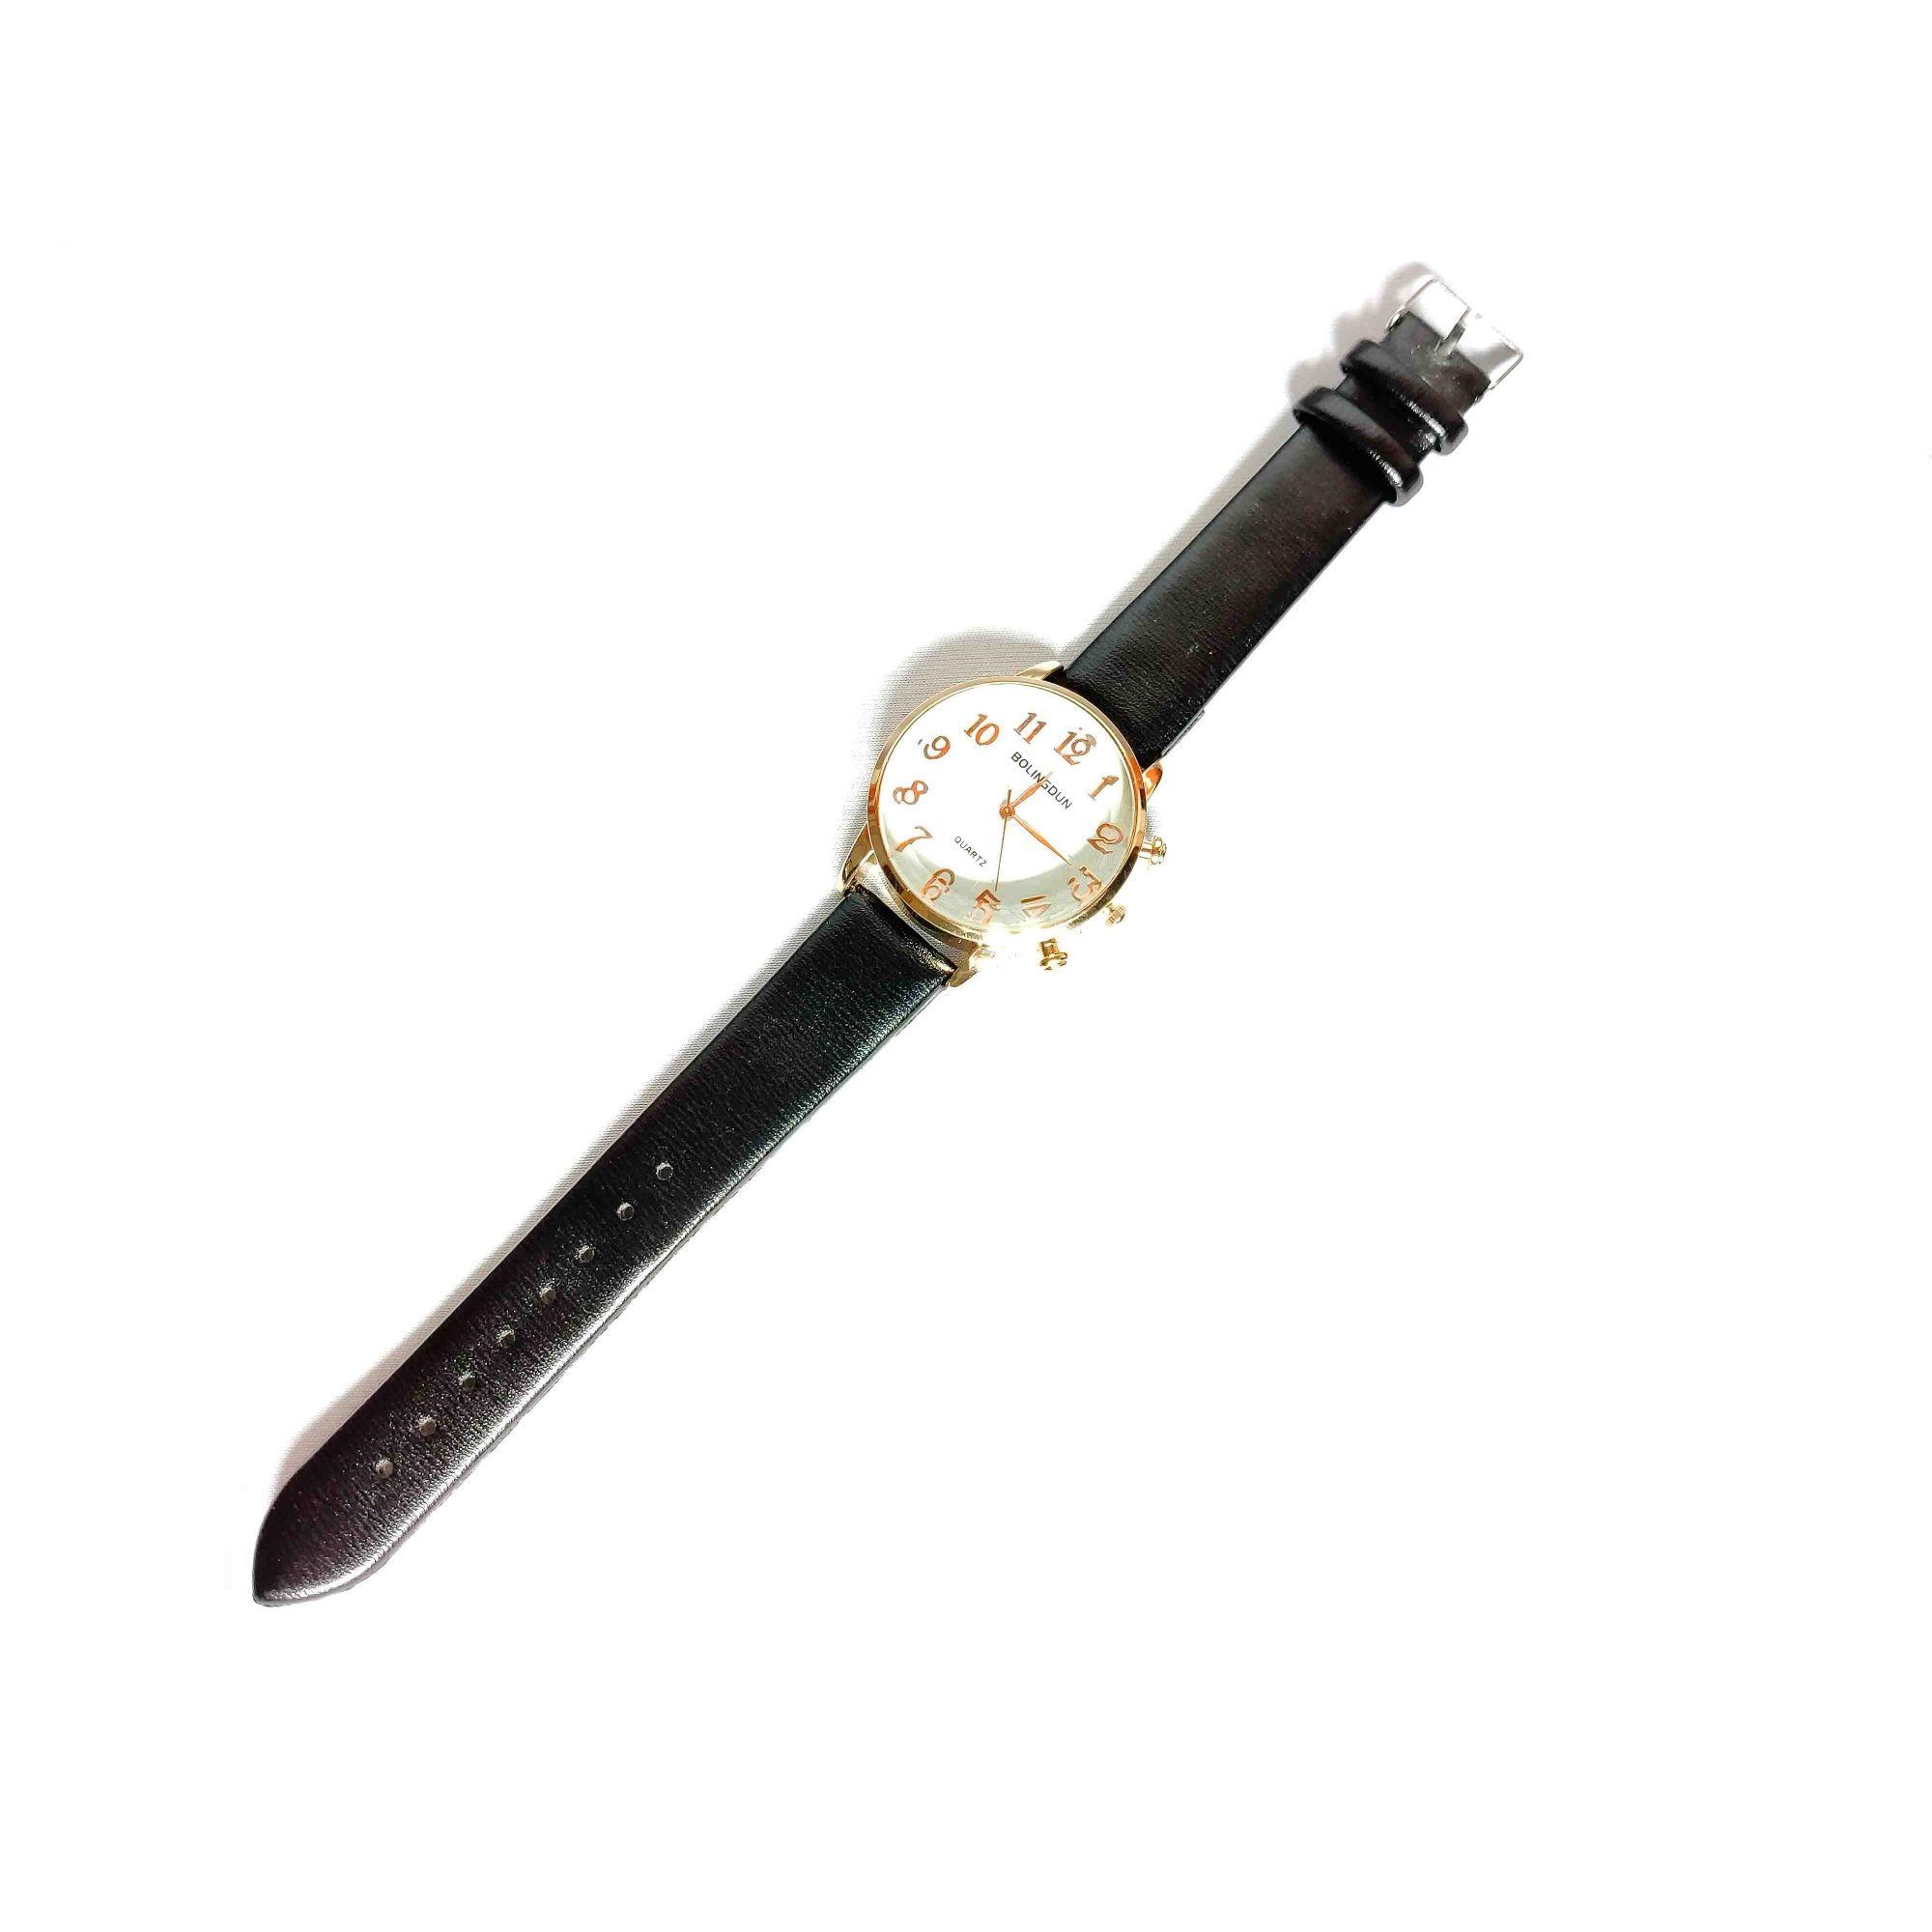 Relógio Feminino Quartz Pulseira Couro Preta